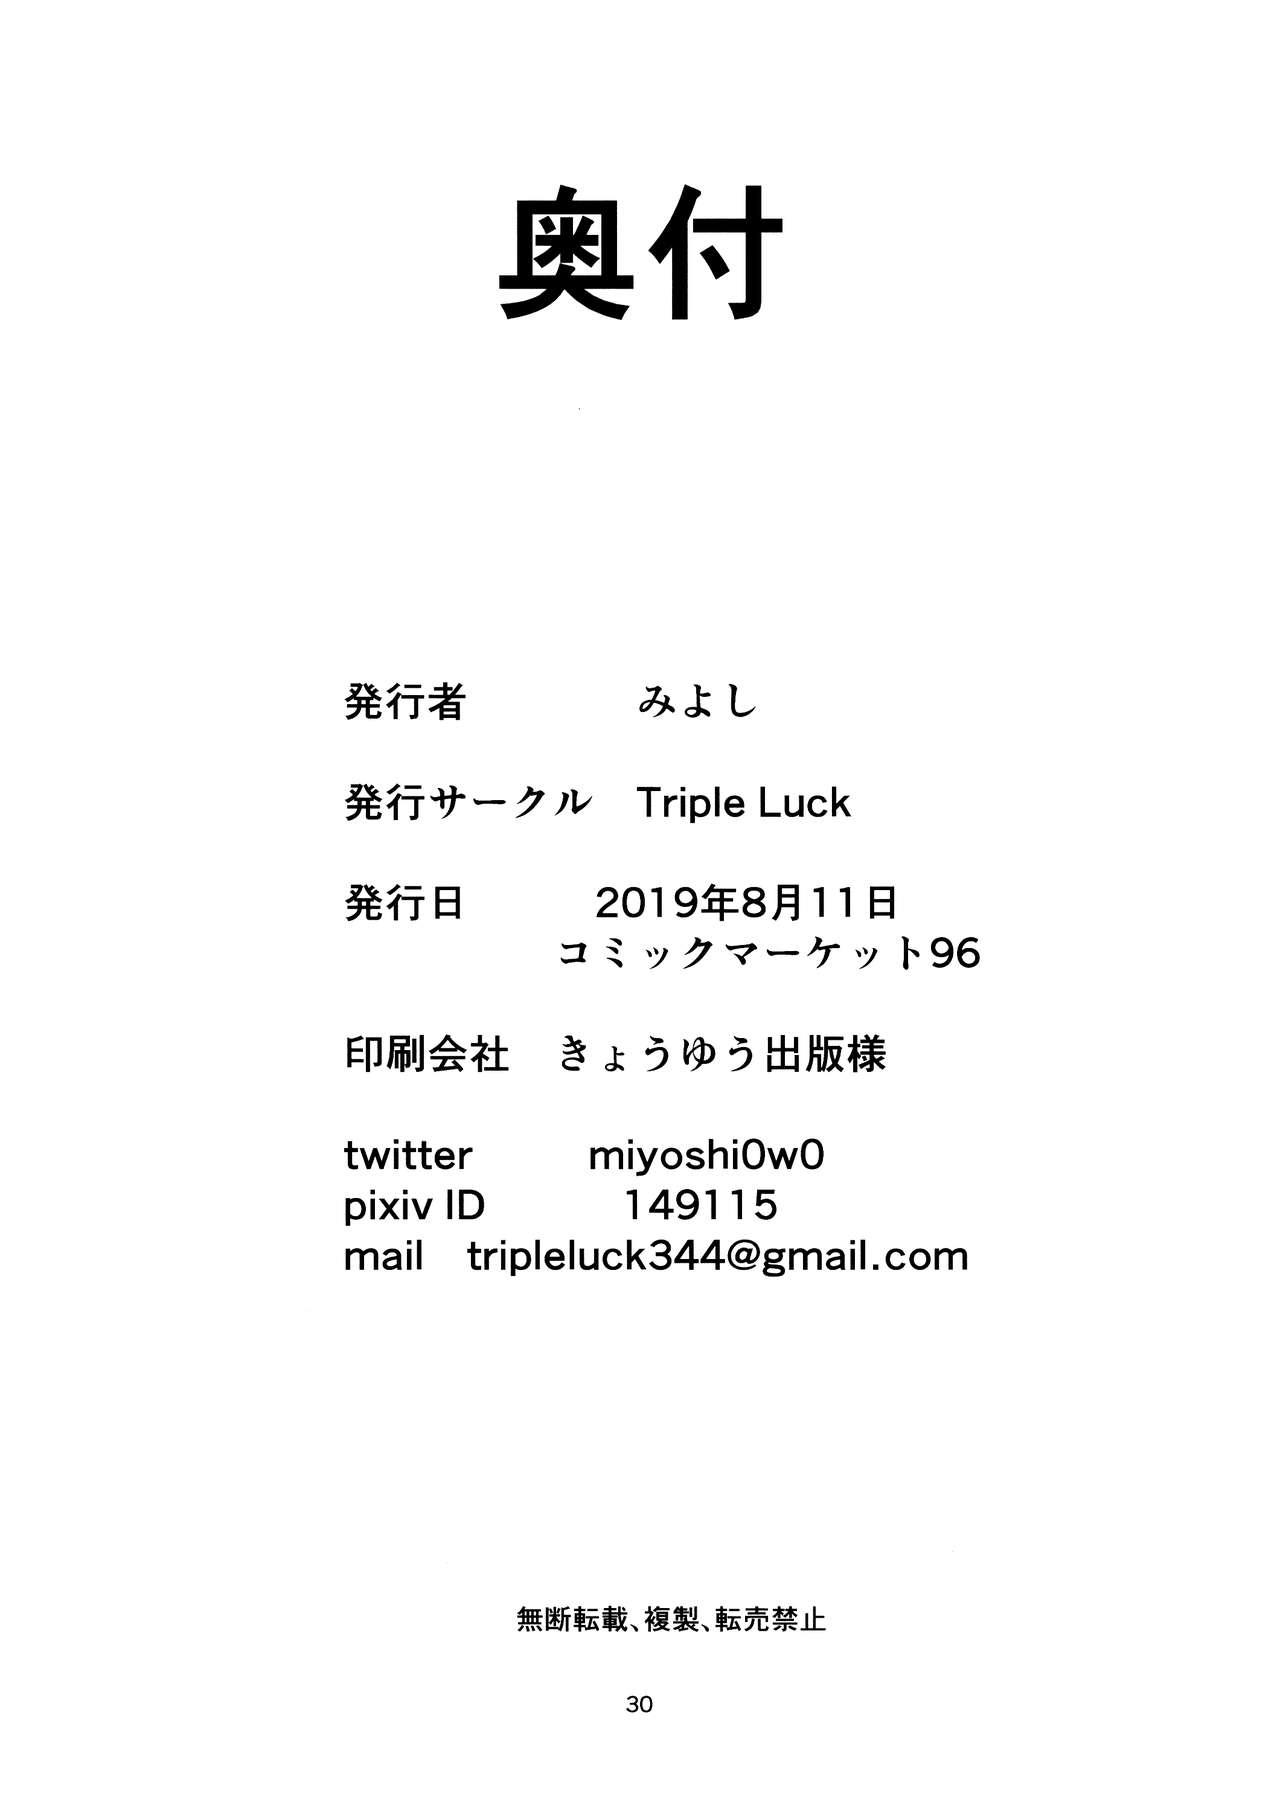 Eh!? Kuwayama Chiyuki kara Bonyuu ga!? 30